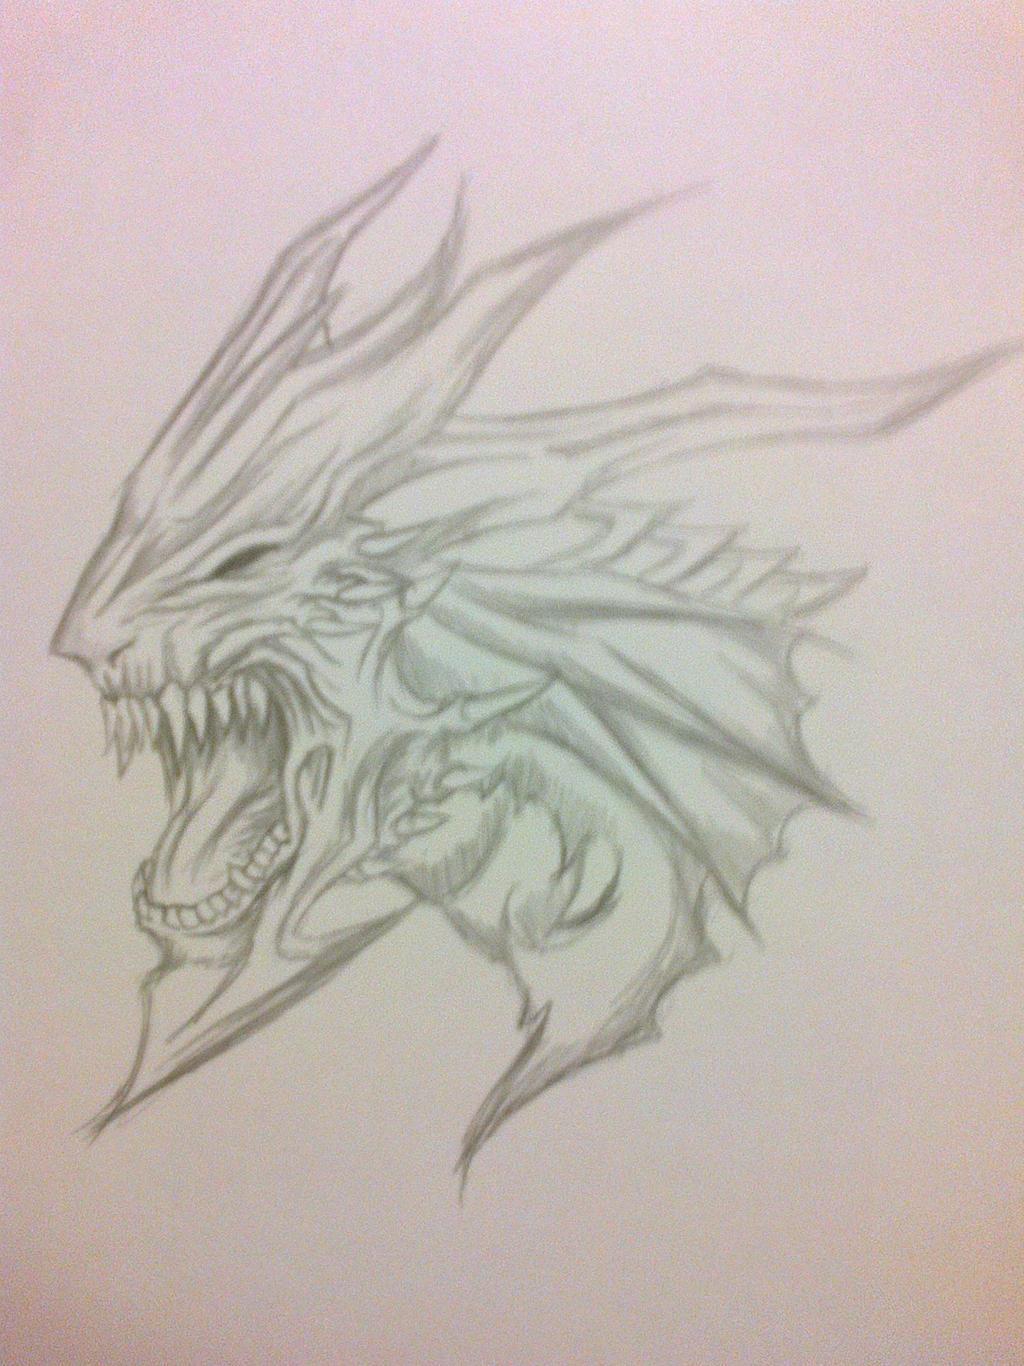 Dragon head rapid skech 2 by War-Off-Evil on DeviantArt